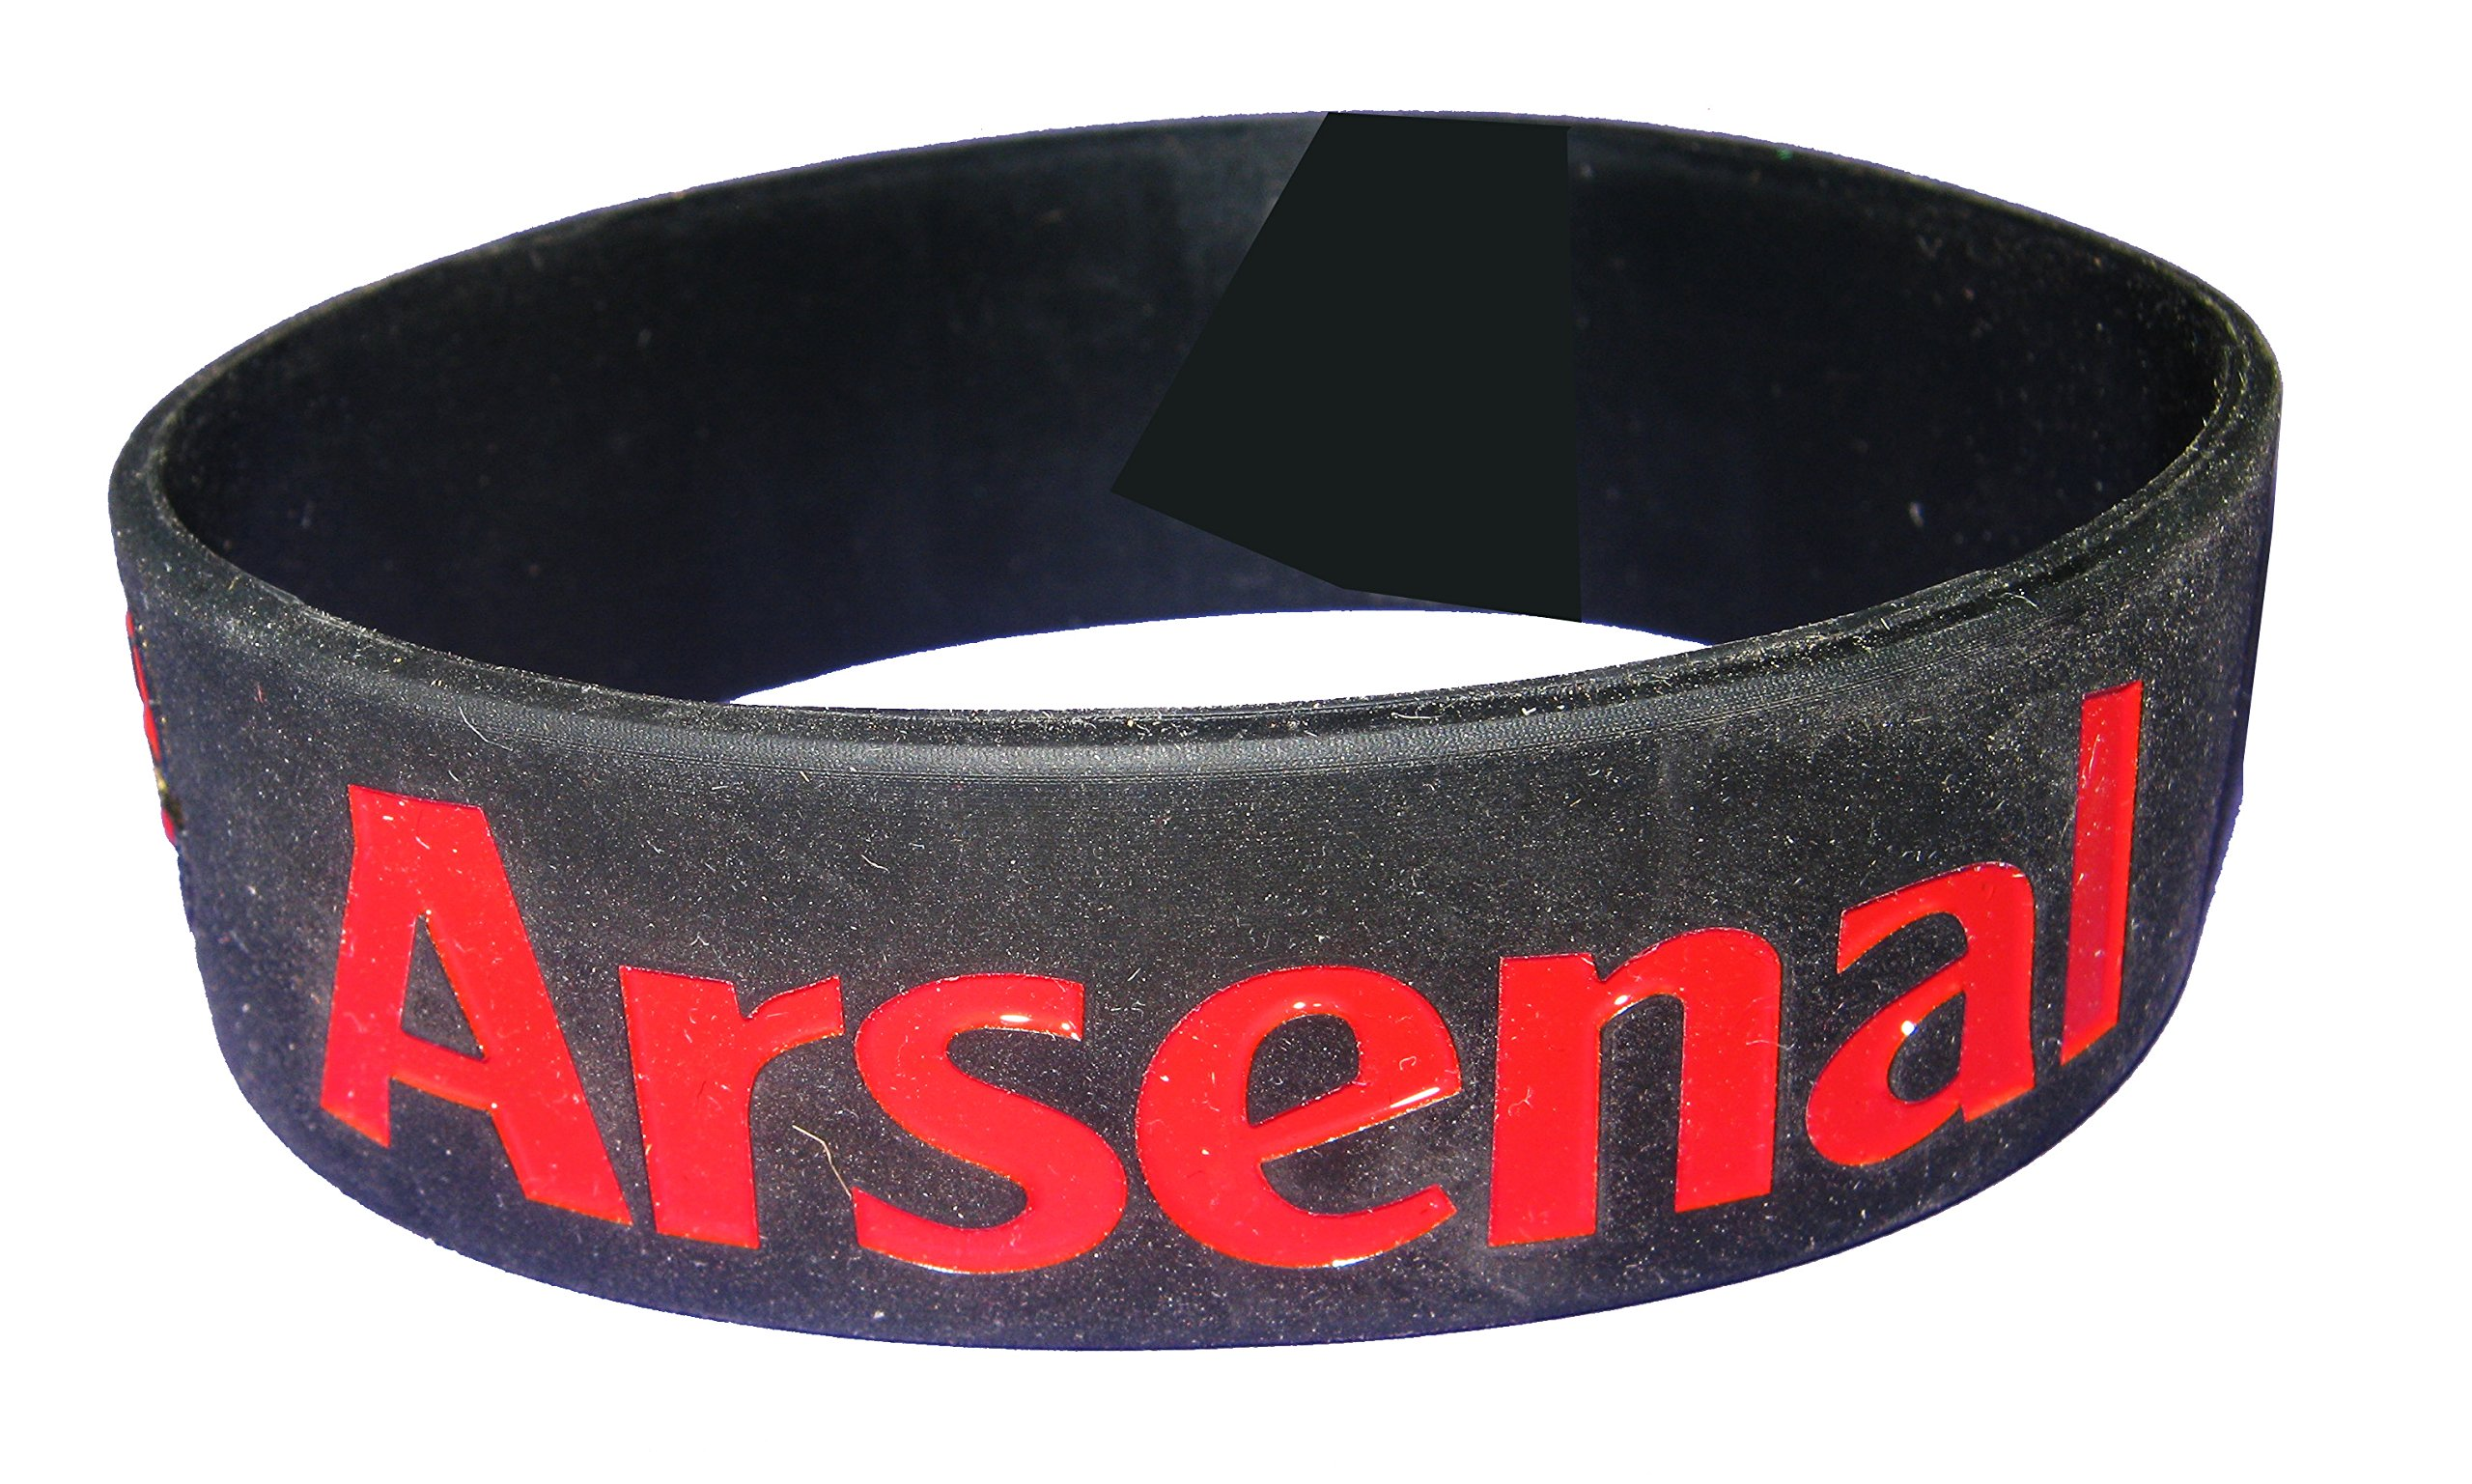 ESHOPPEE Arsenal wrist band